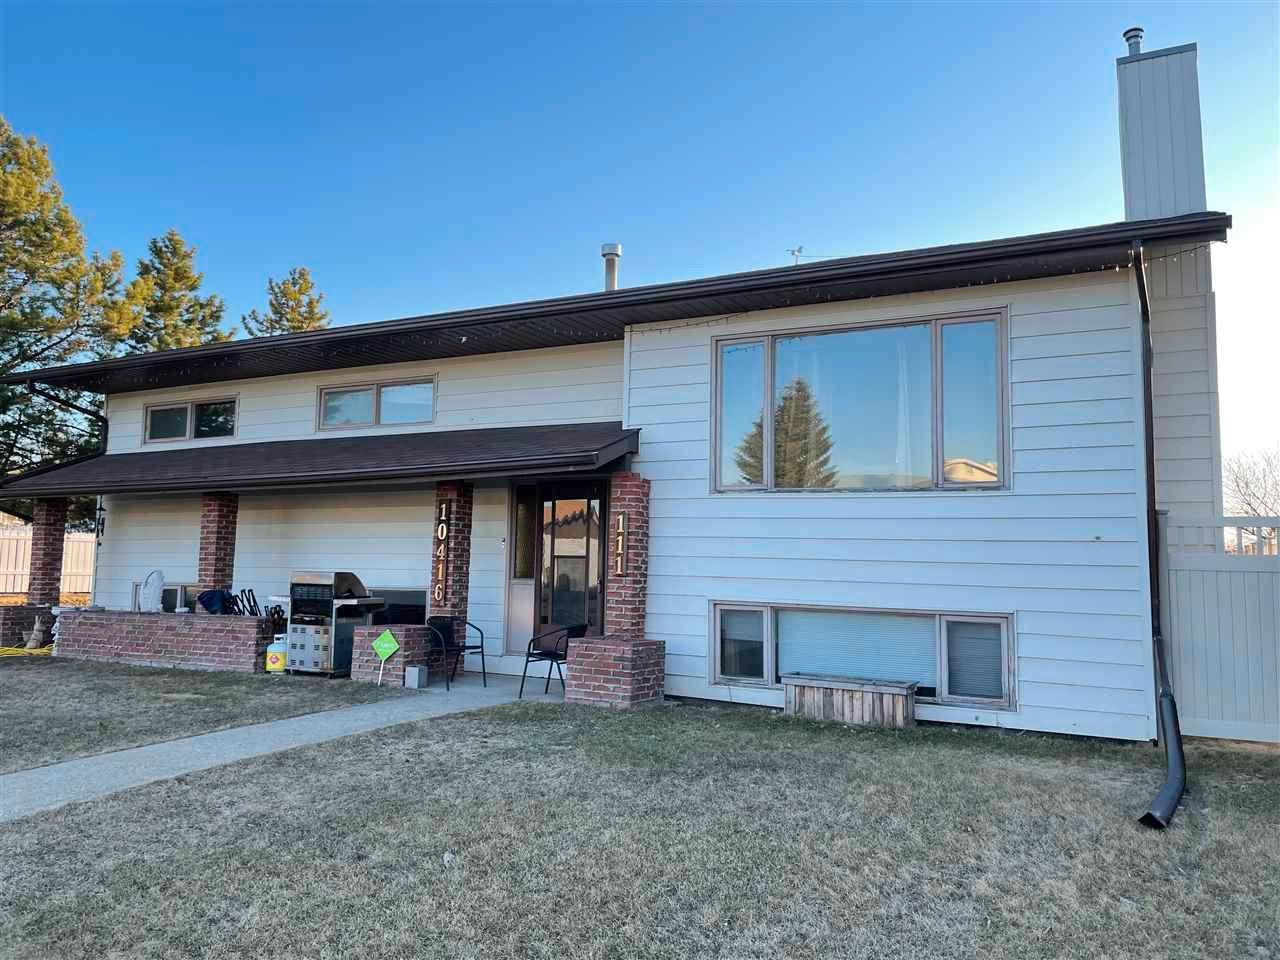 Main Photo: 10416 111 Avenue: Westlock House for sale : MLS®# E4239474